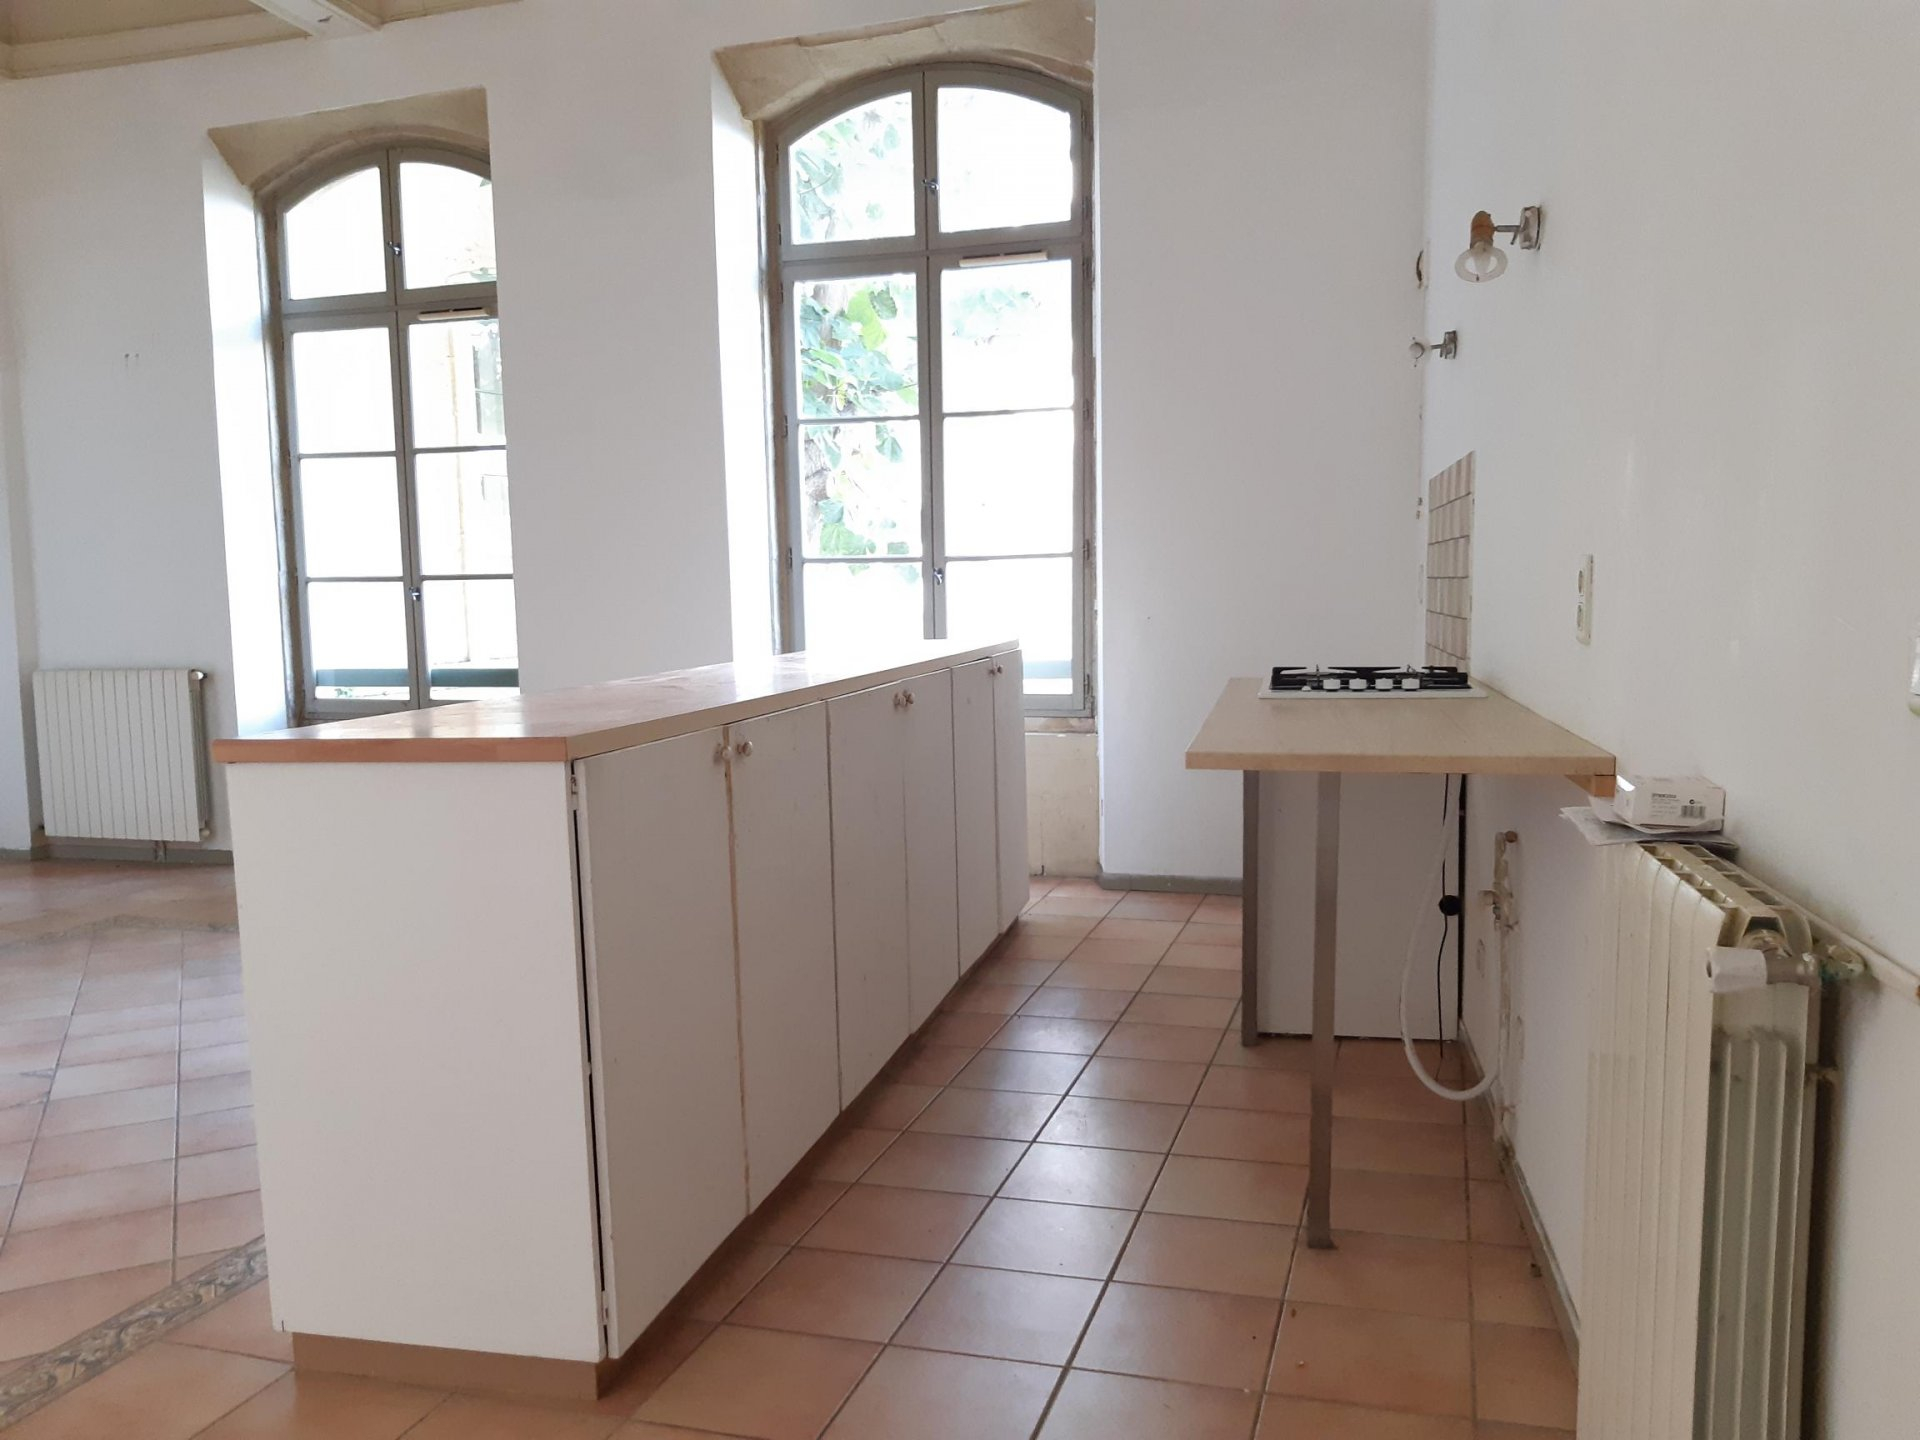 Location Appartement TARASCON surface habitable de 98 m²